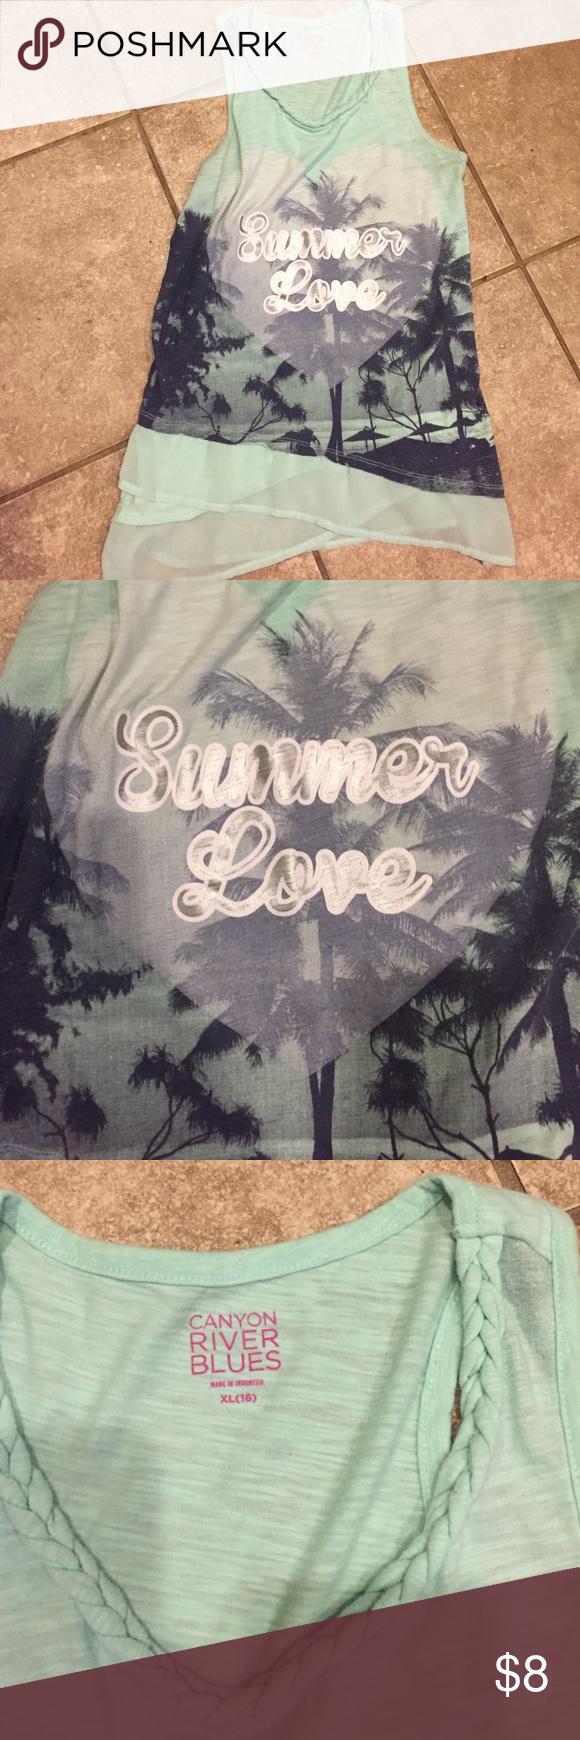 Summer dressy tank Hardly worn Canyon river blues  Shirts & Tops Tank Tops